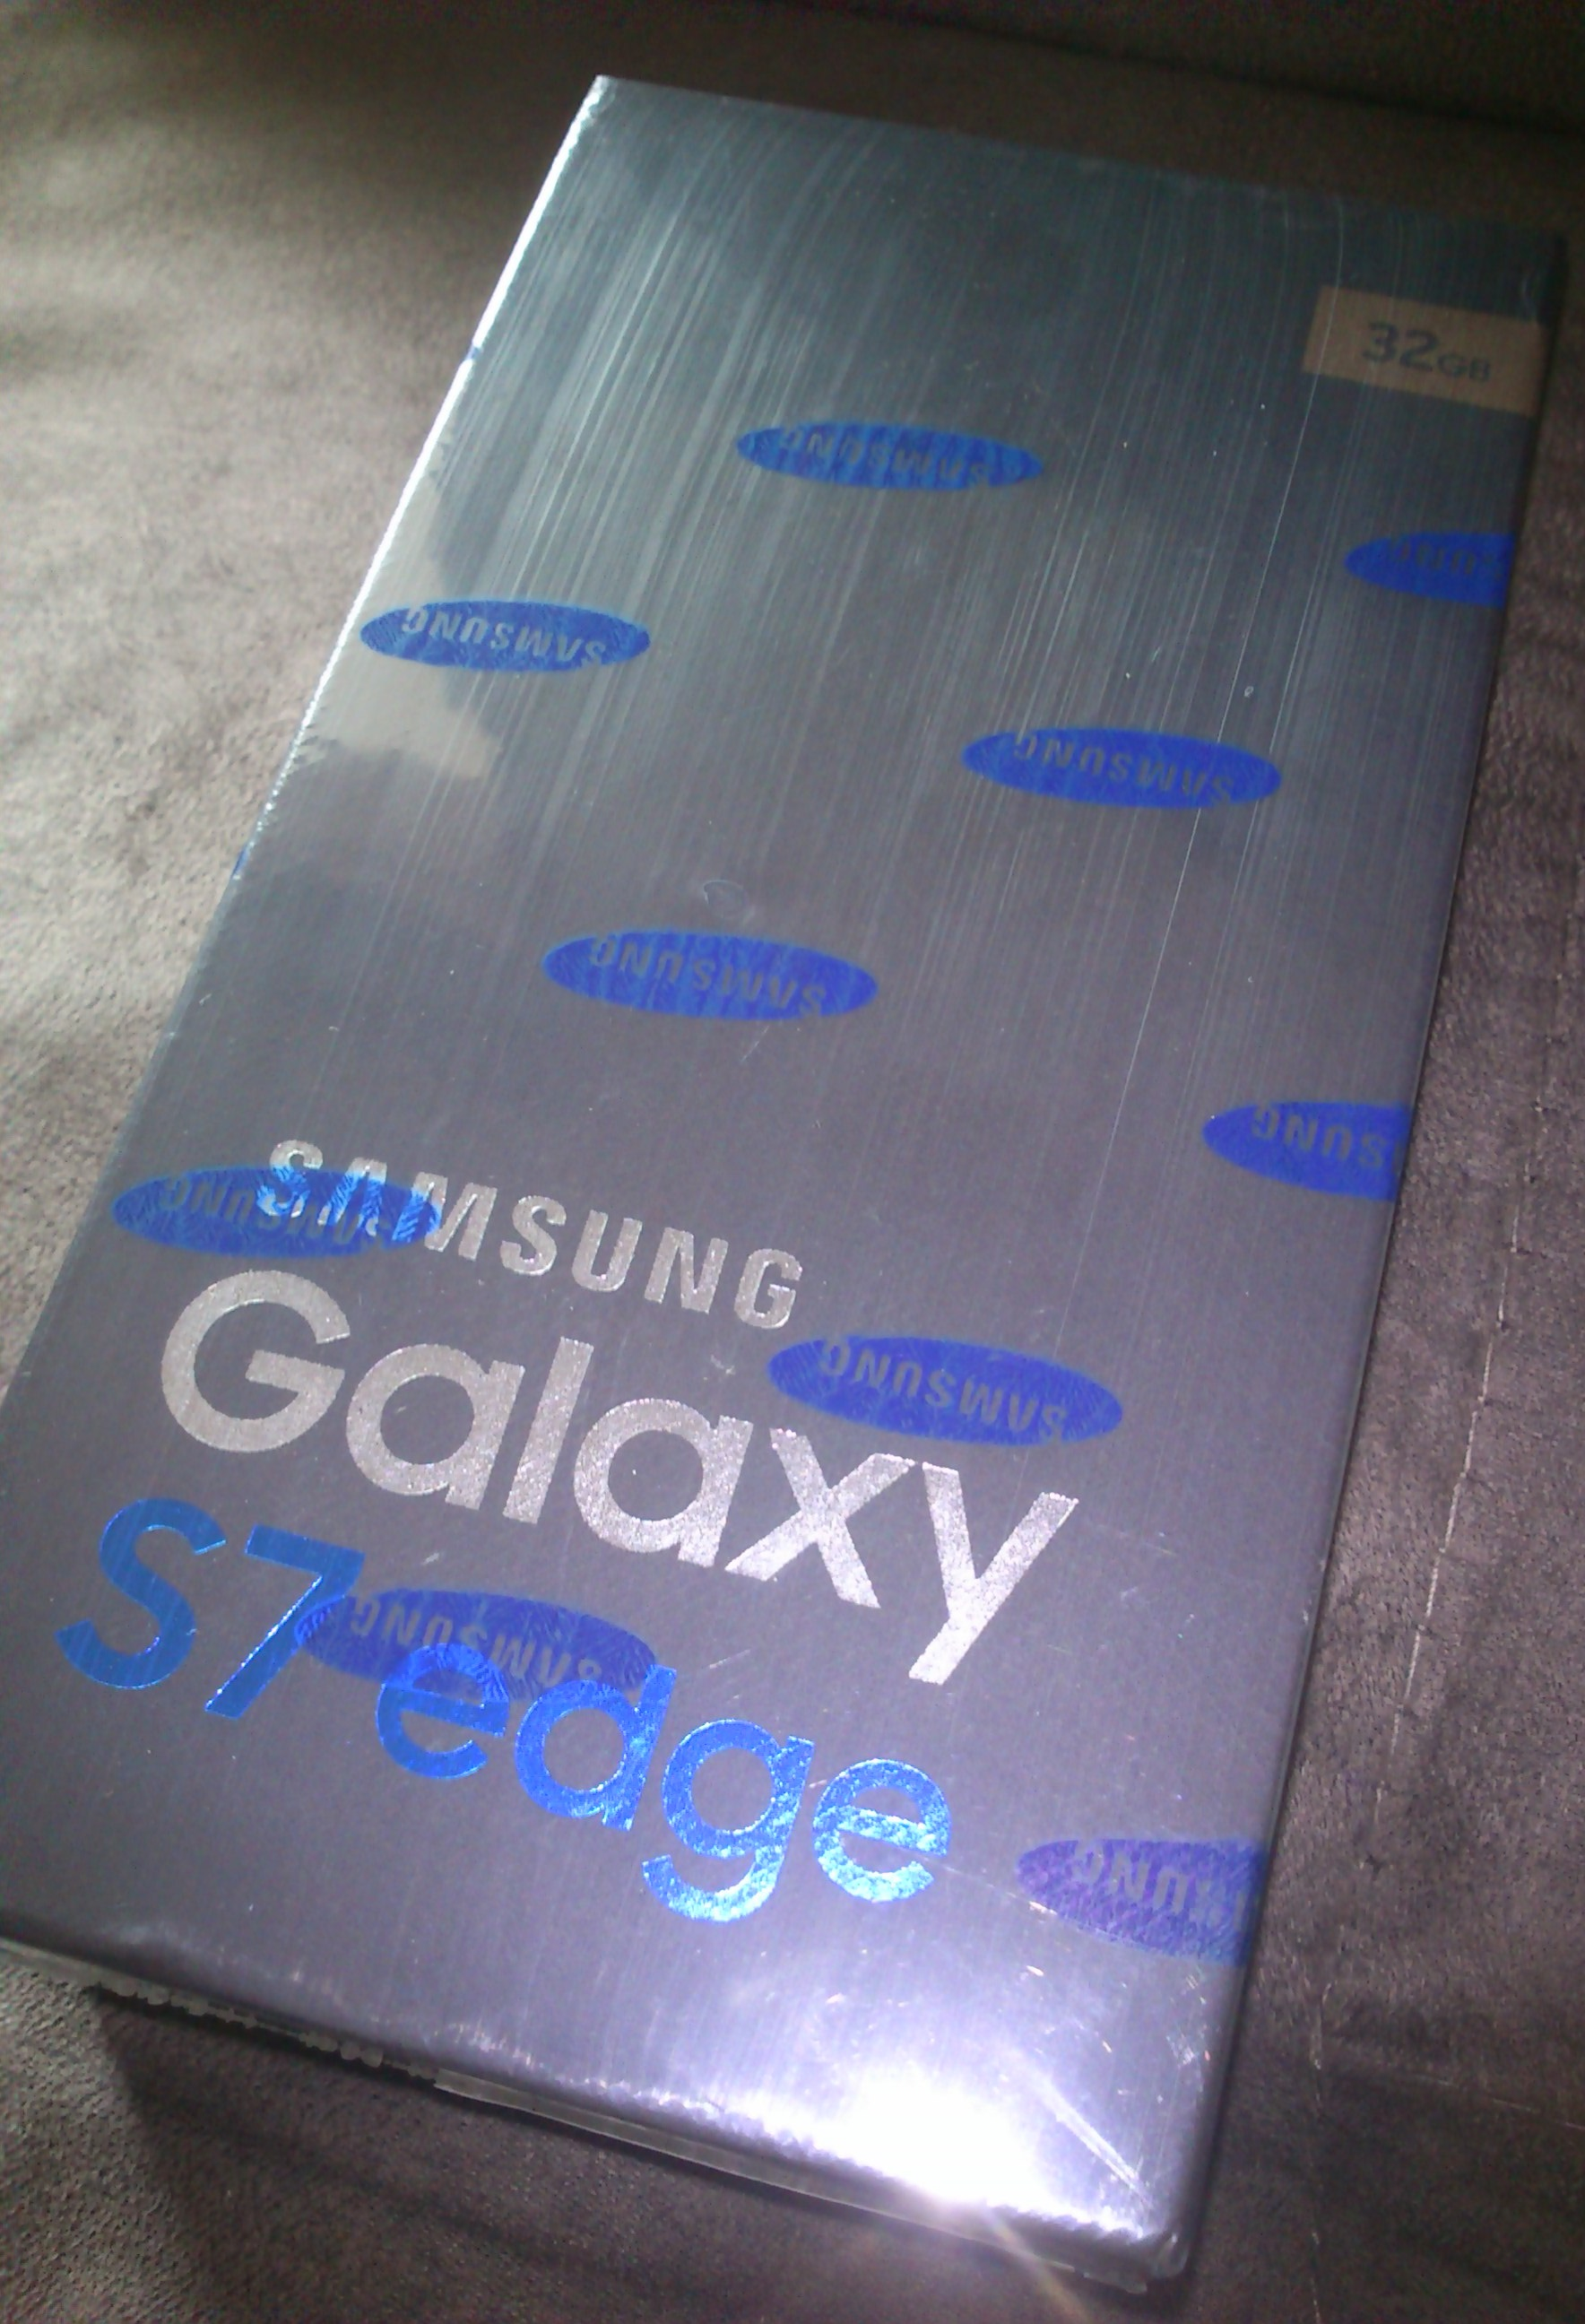 Jual Samsung Galaxy S7 Edge Sm G935fd Garansi Resmi Sein Indonesia Gold Bonus Semua Diskon Tokopedia